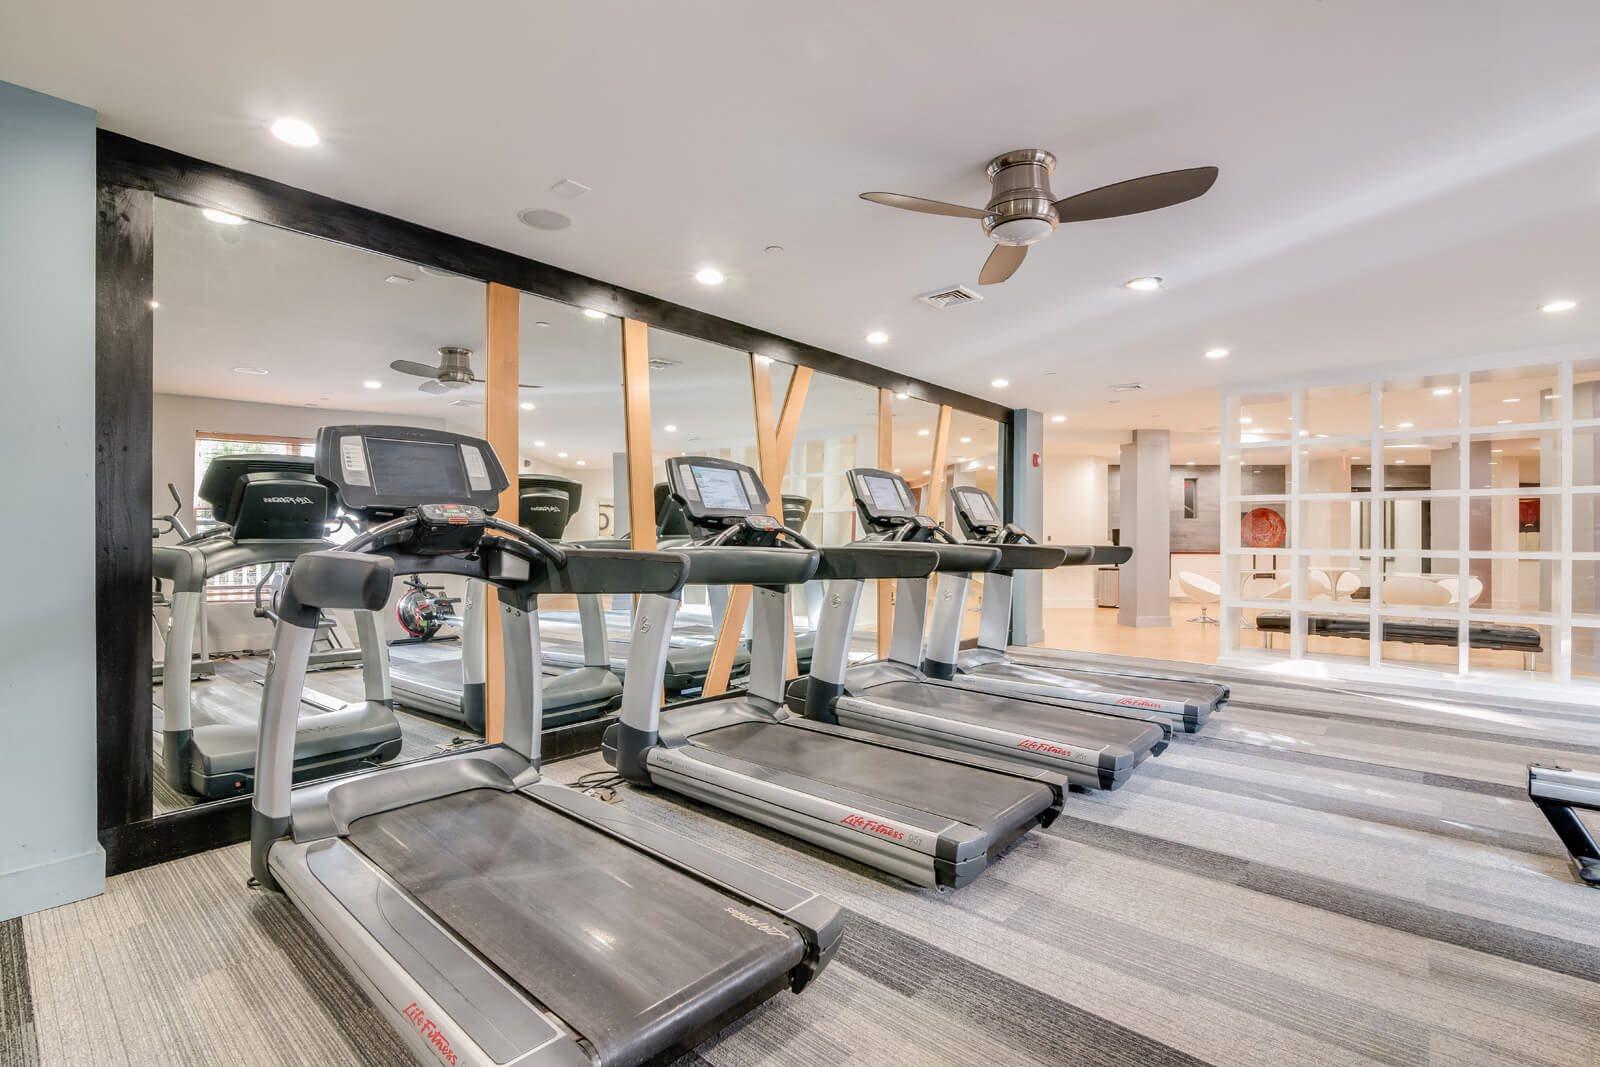 Cardio Equipment in Gym at Windsor at Contee Crossing, Laurel, 20707